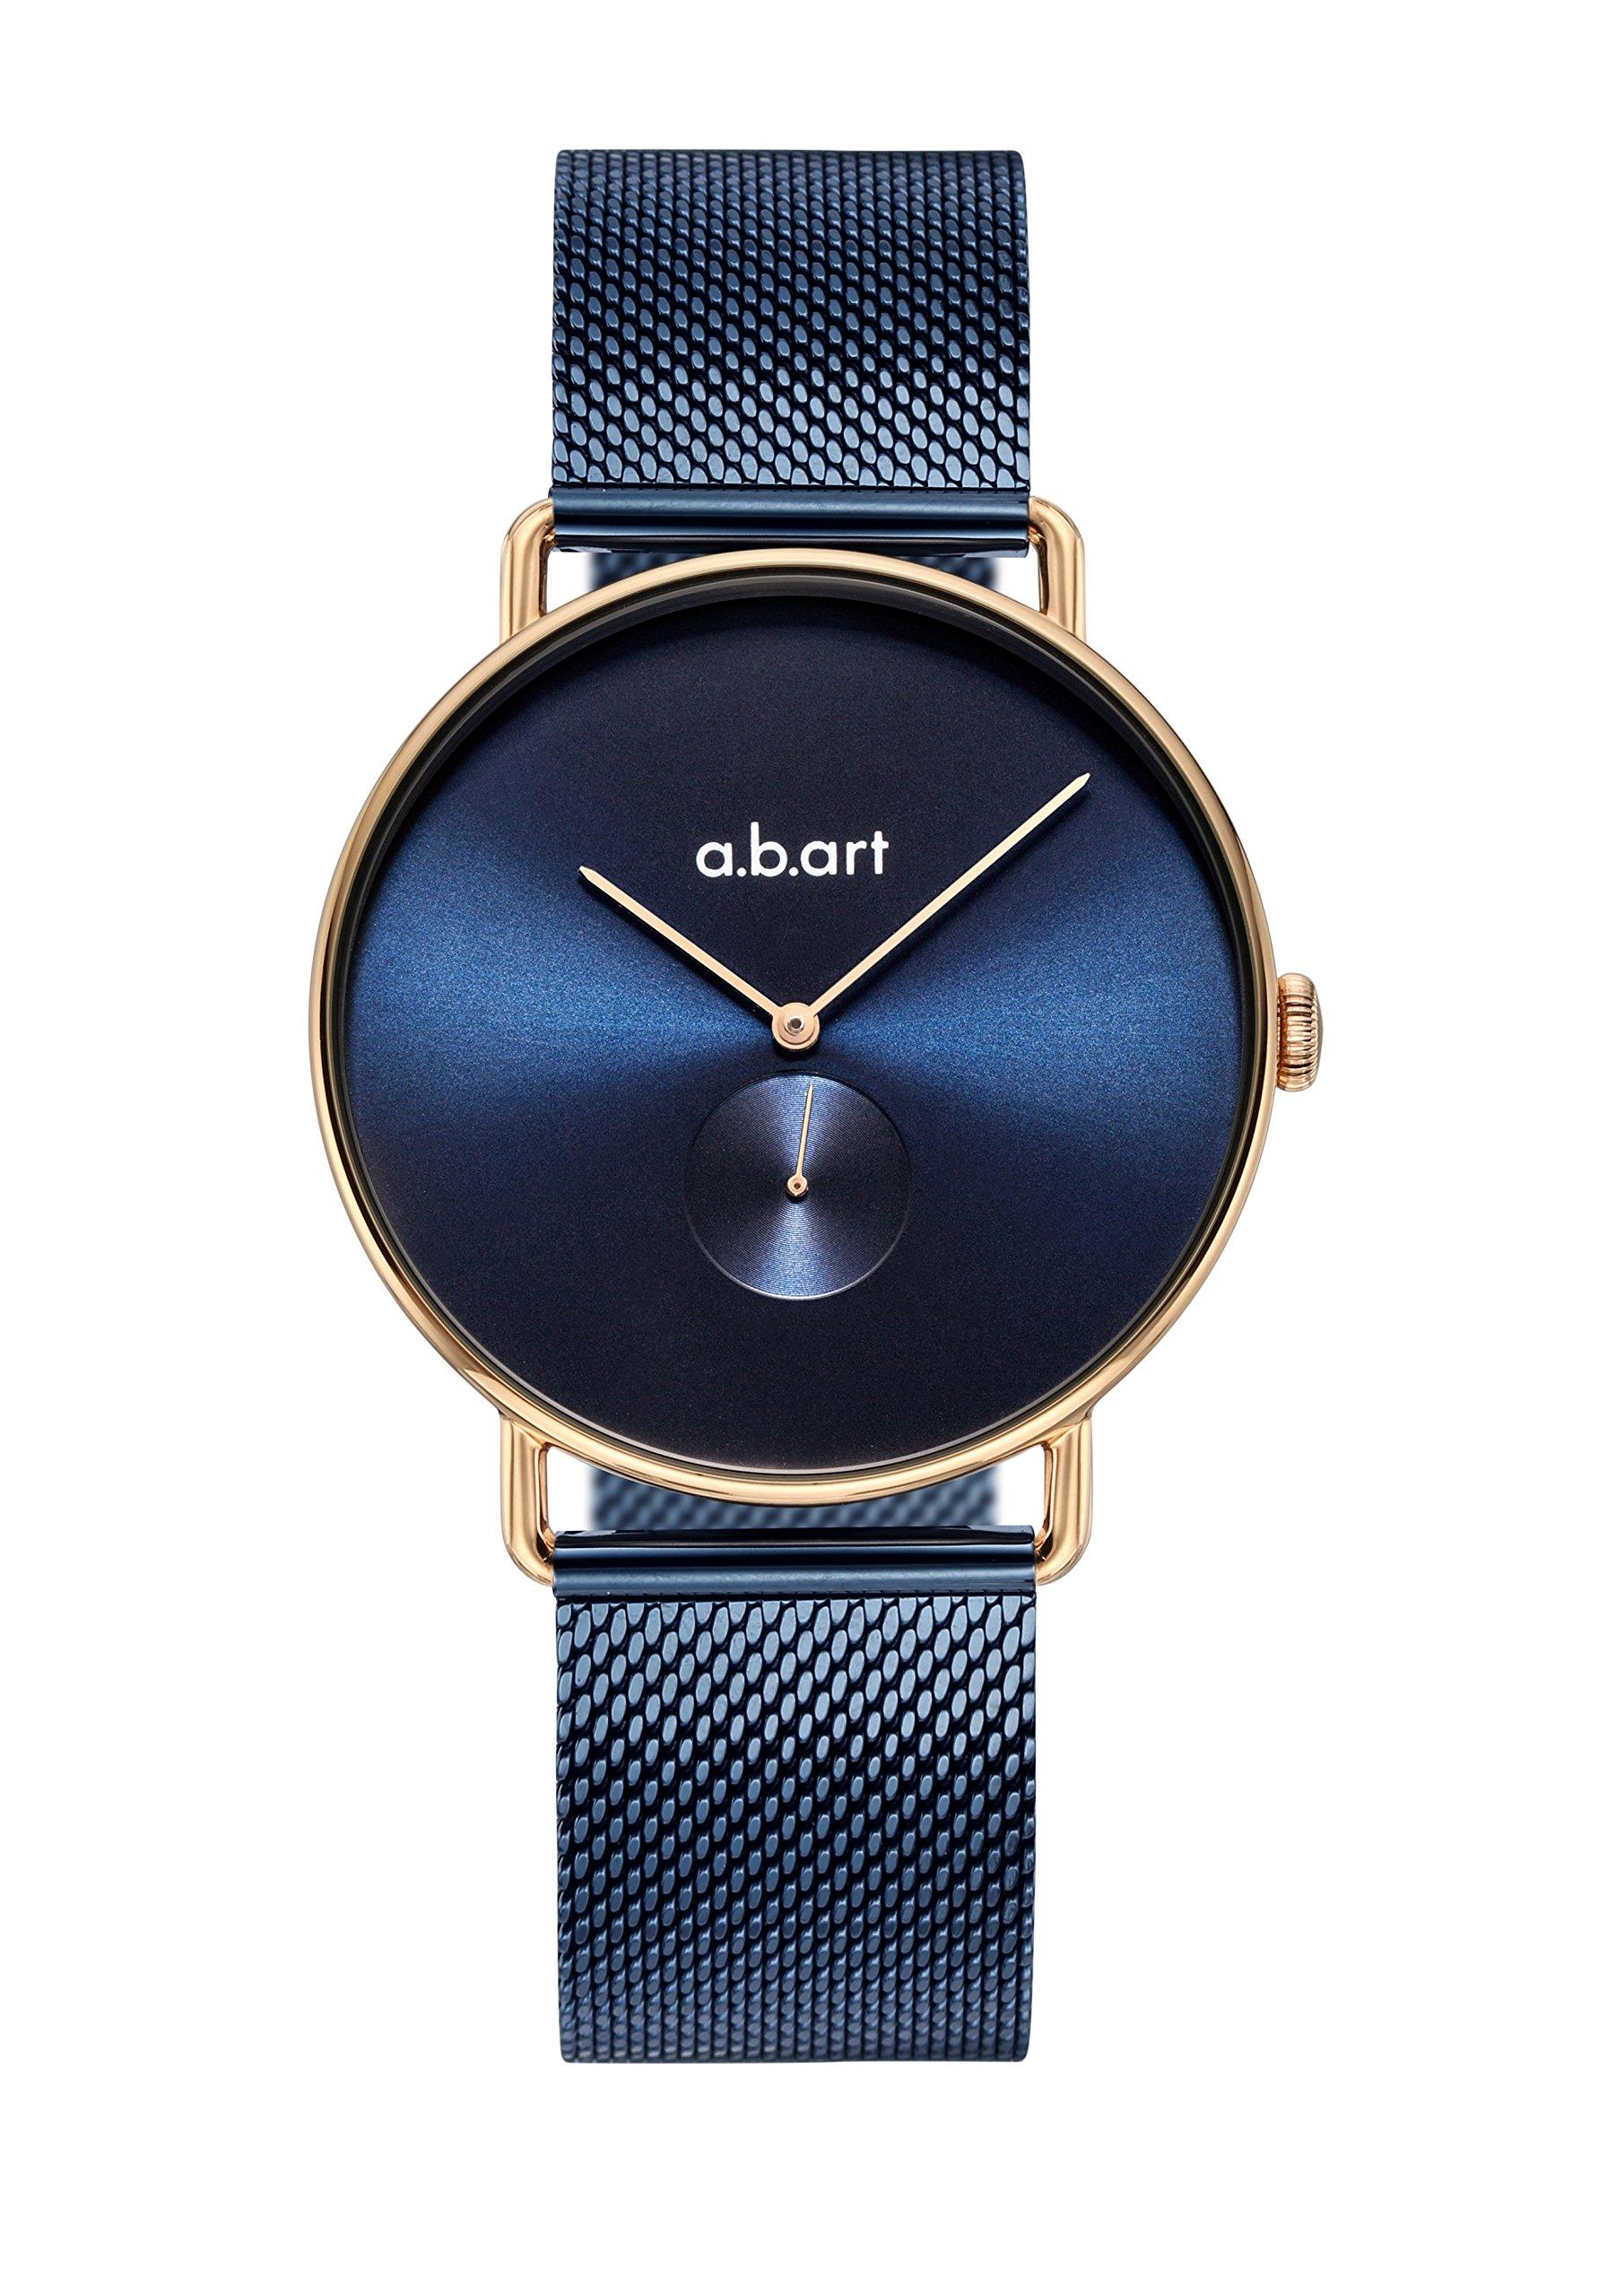 abart Blue Watch FA36-012-5S Quartz Movement Blue Dial Sapphire Crystal Women Wristwatch